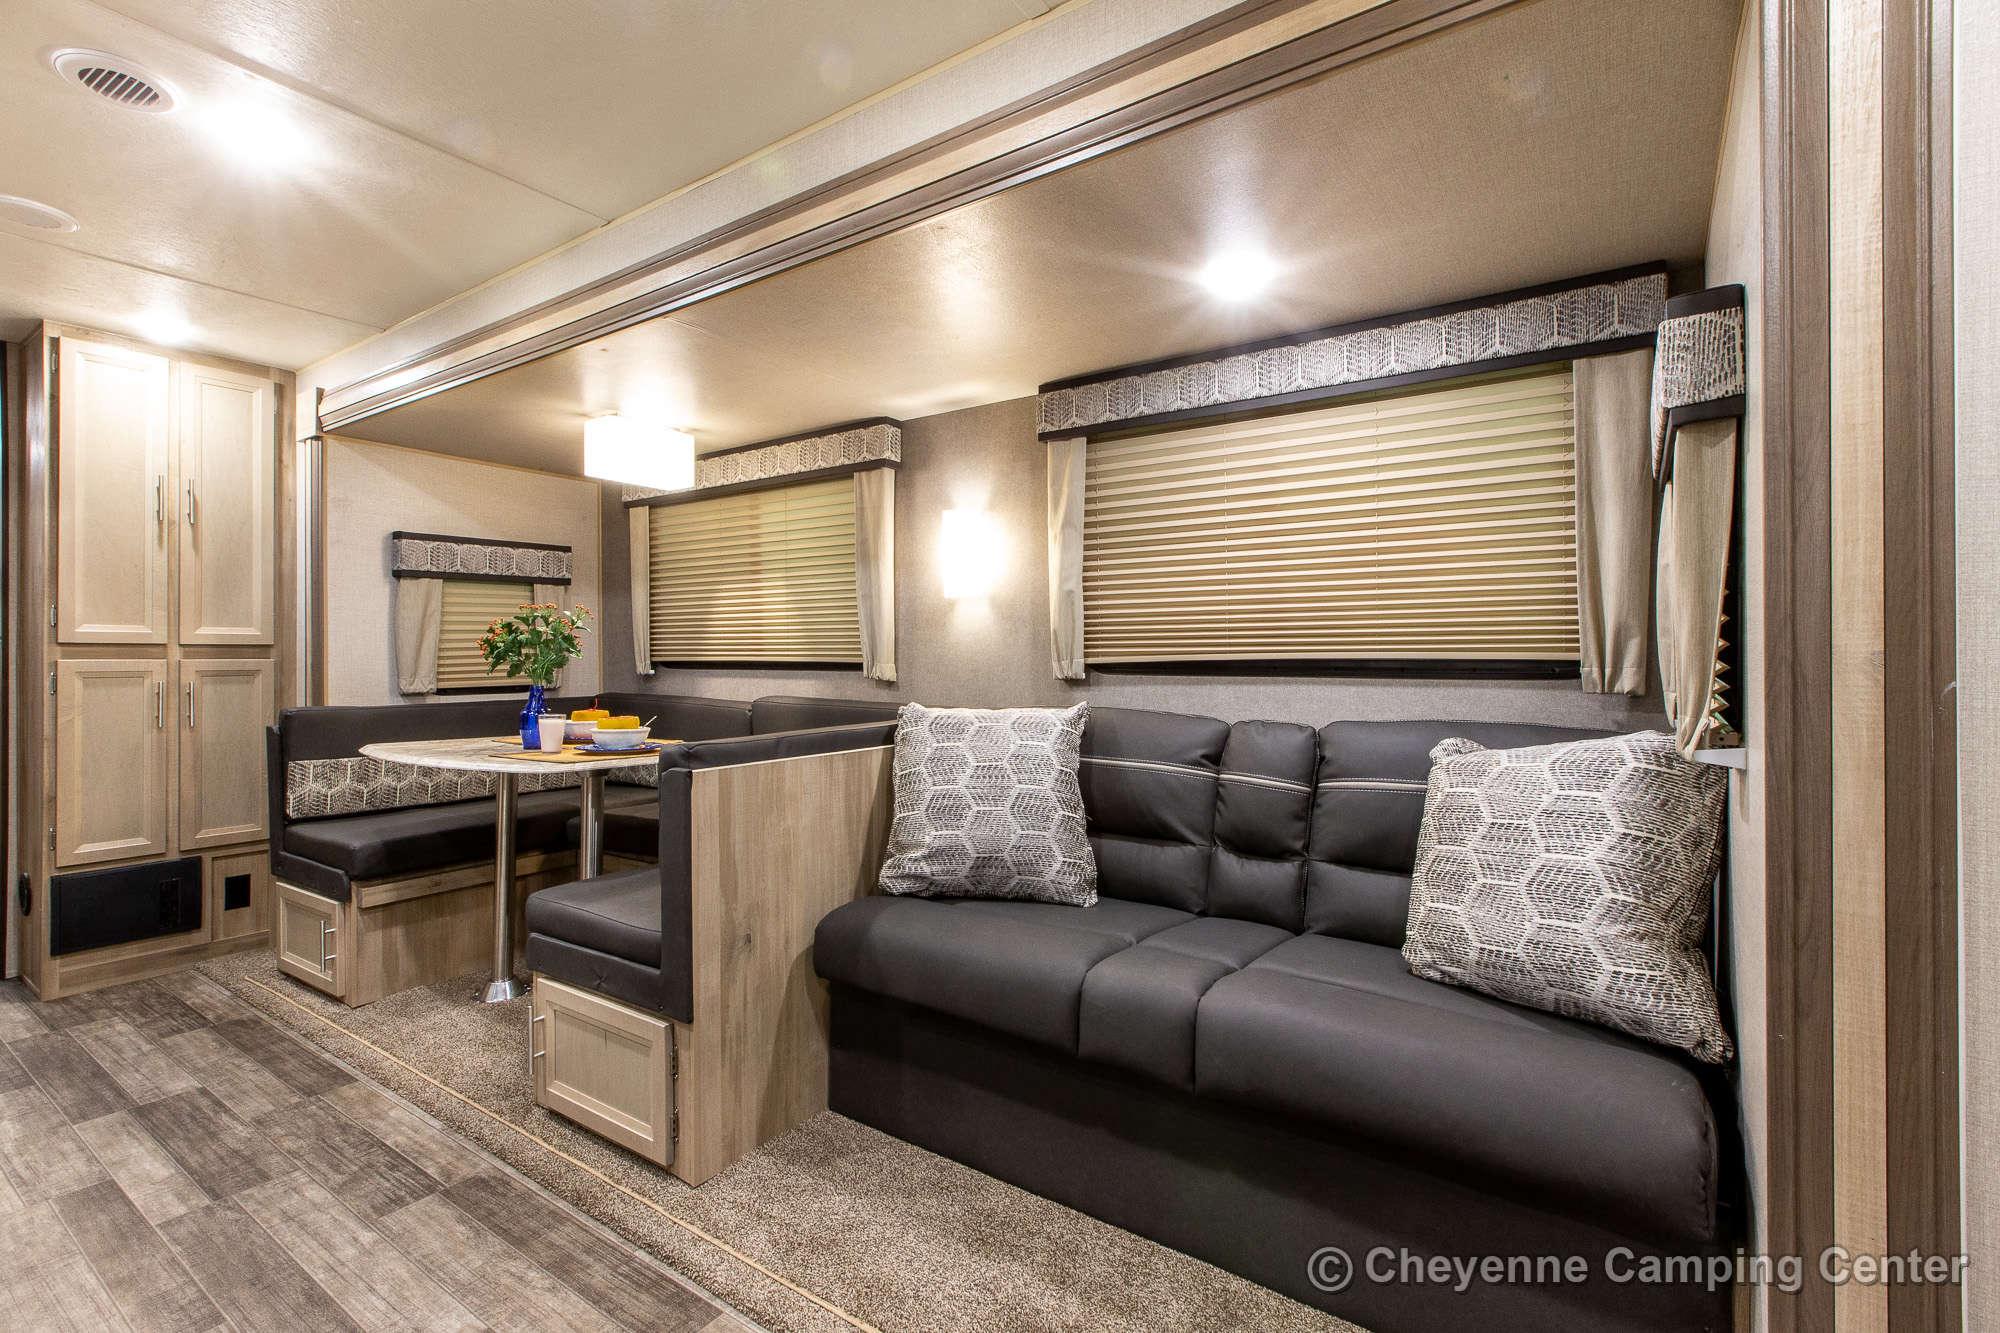 2022 Coachmen Catalina Legacy Edition 323BHDSCK Bunkhouse Travel Trailer Interior Image